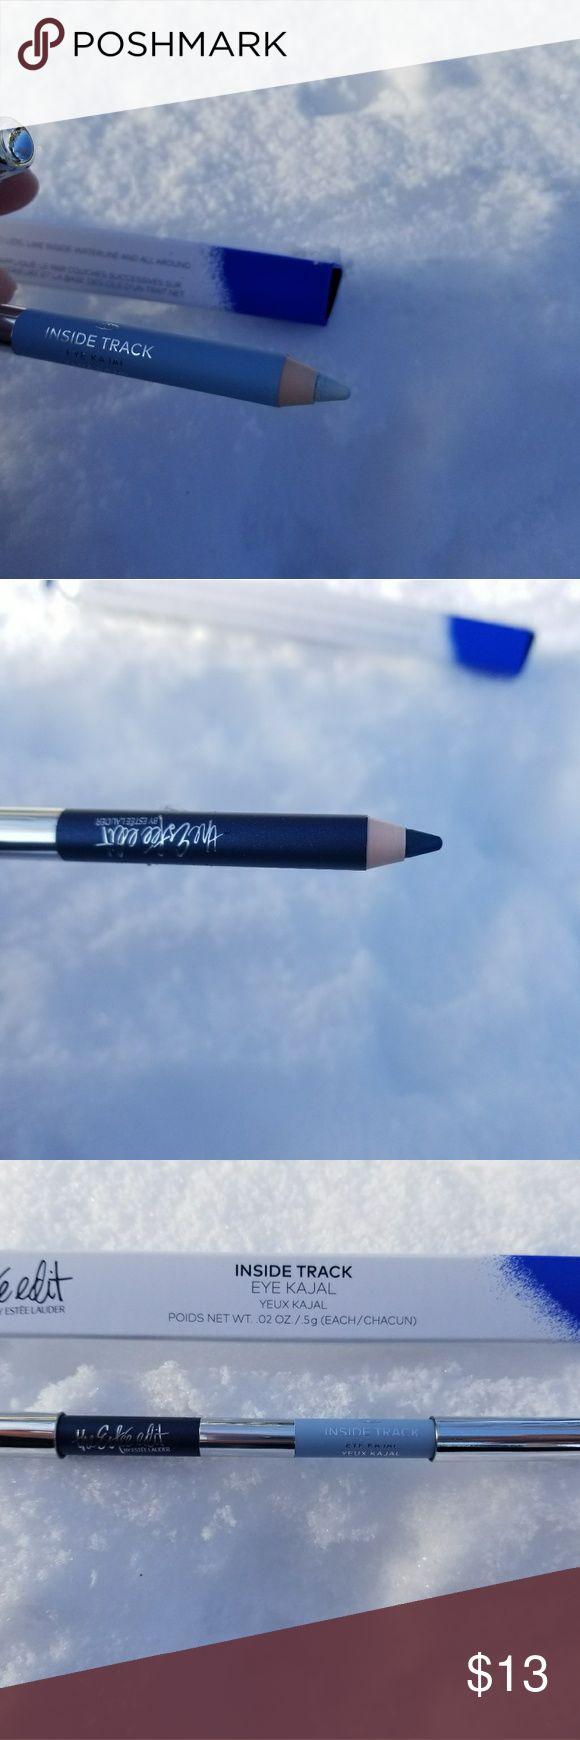 2 The Estee edit INSIDE TRACK EYE KAJAL. New. Authentic.   2 The Estee edit by Estee lauder INSIDE TRACK EYE KAJAL. NAVY/baby blue.  NOTE: I have 2 in STOCK. Estee Lauder Makeup Eyeliner